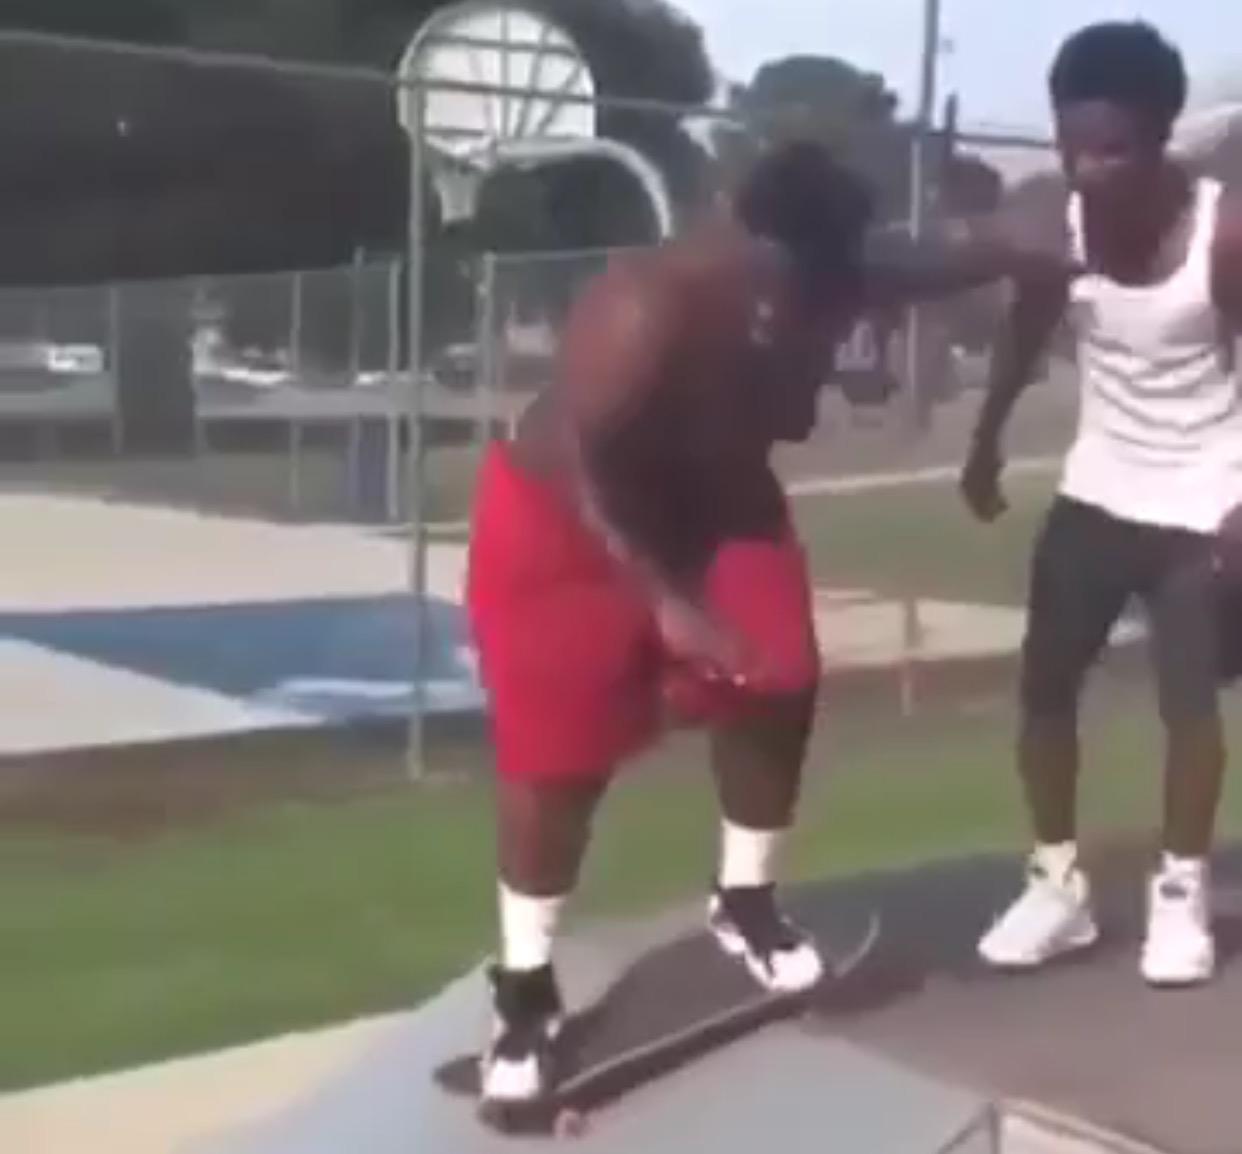 Se sube por primera vez a un skate... Â¡DOLOR! - CABROWORLD